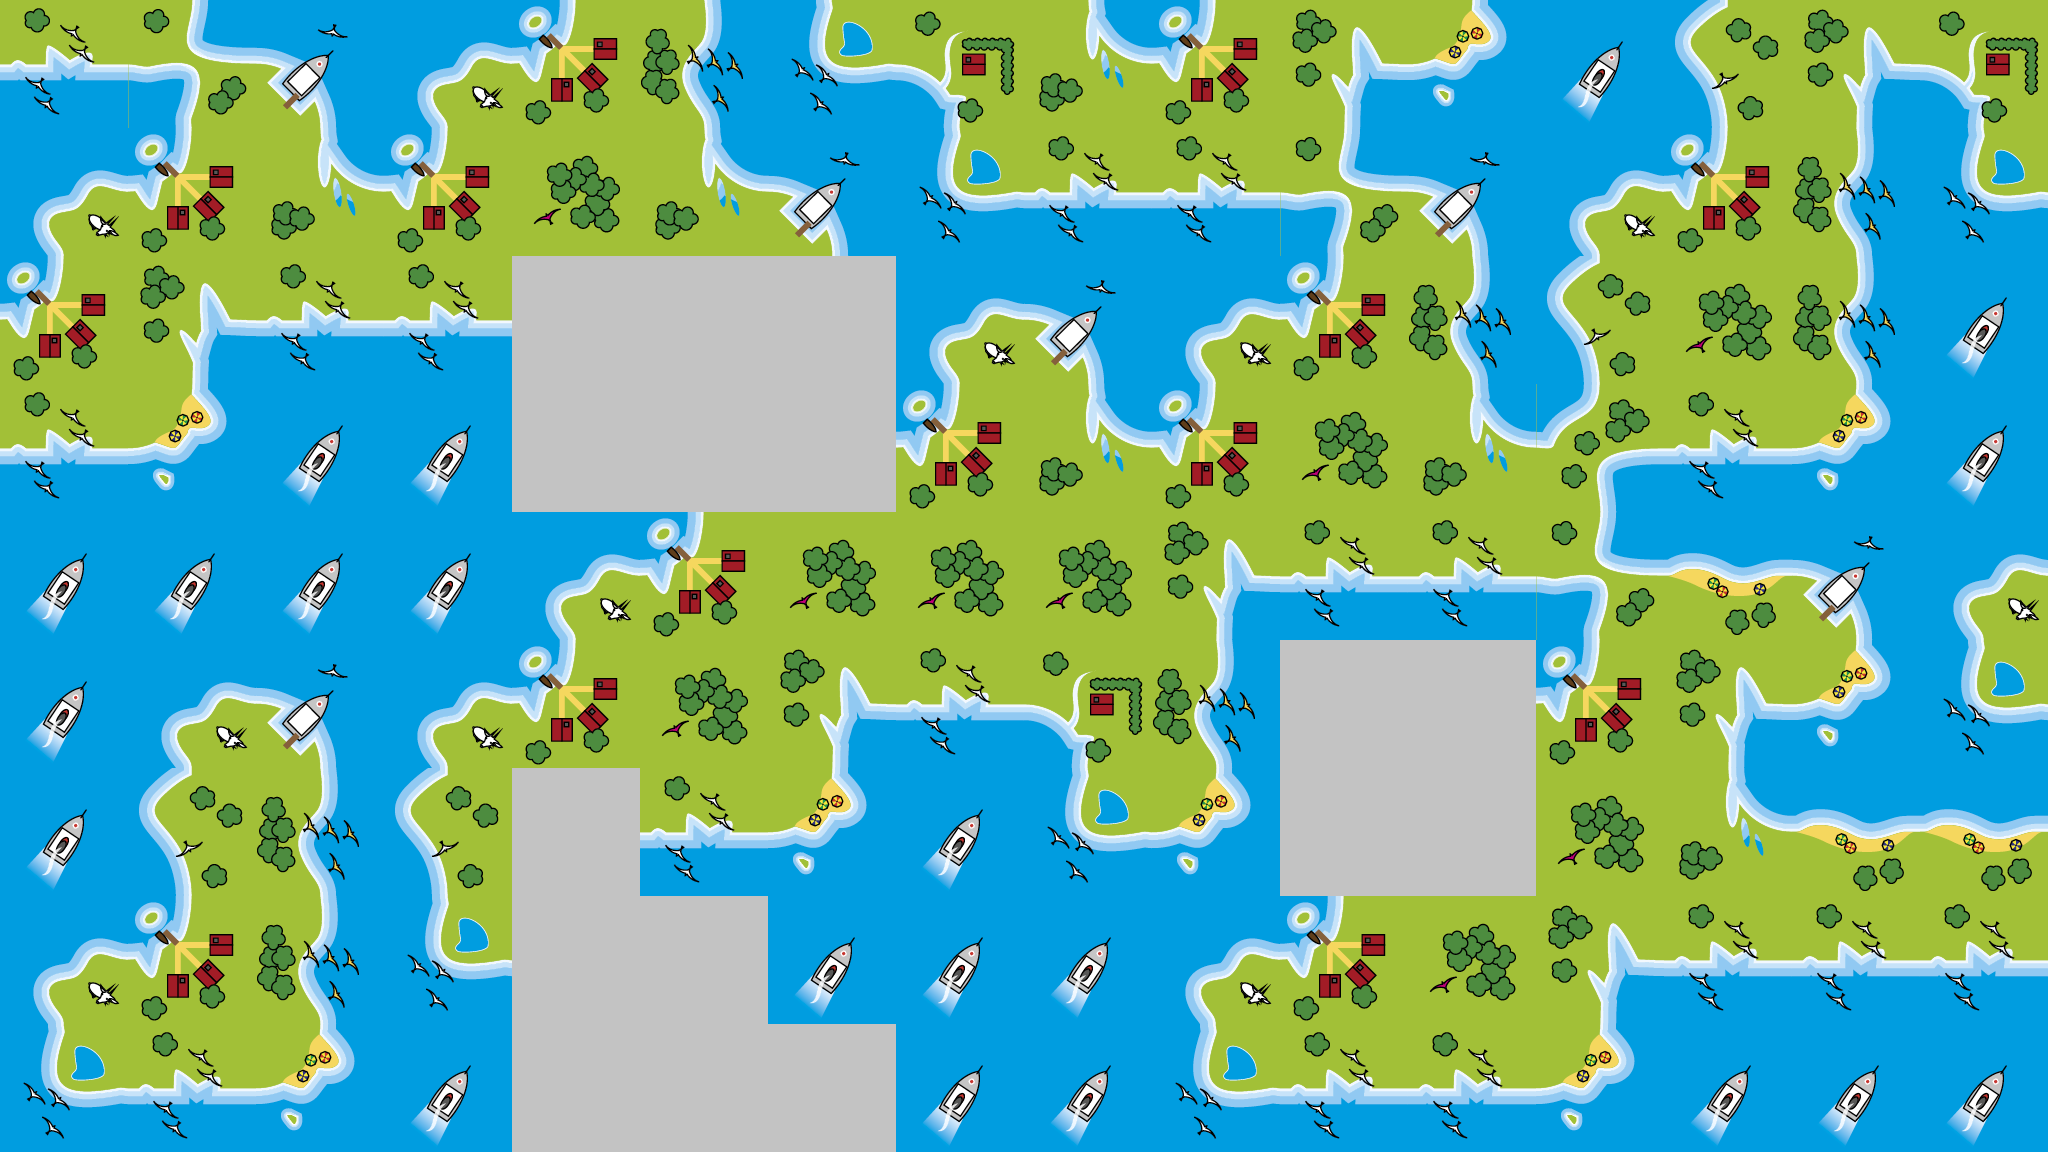 j2-Kacheln/beispieldaten/bilder/map4_gray.png